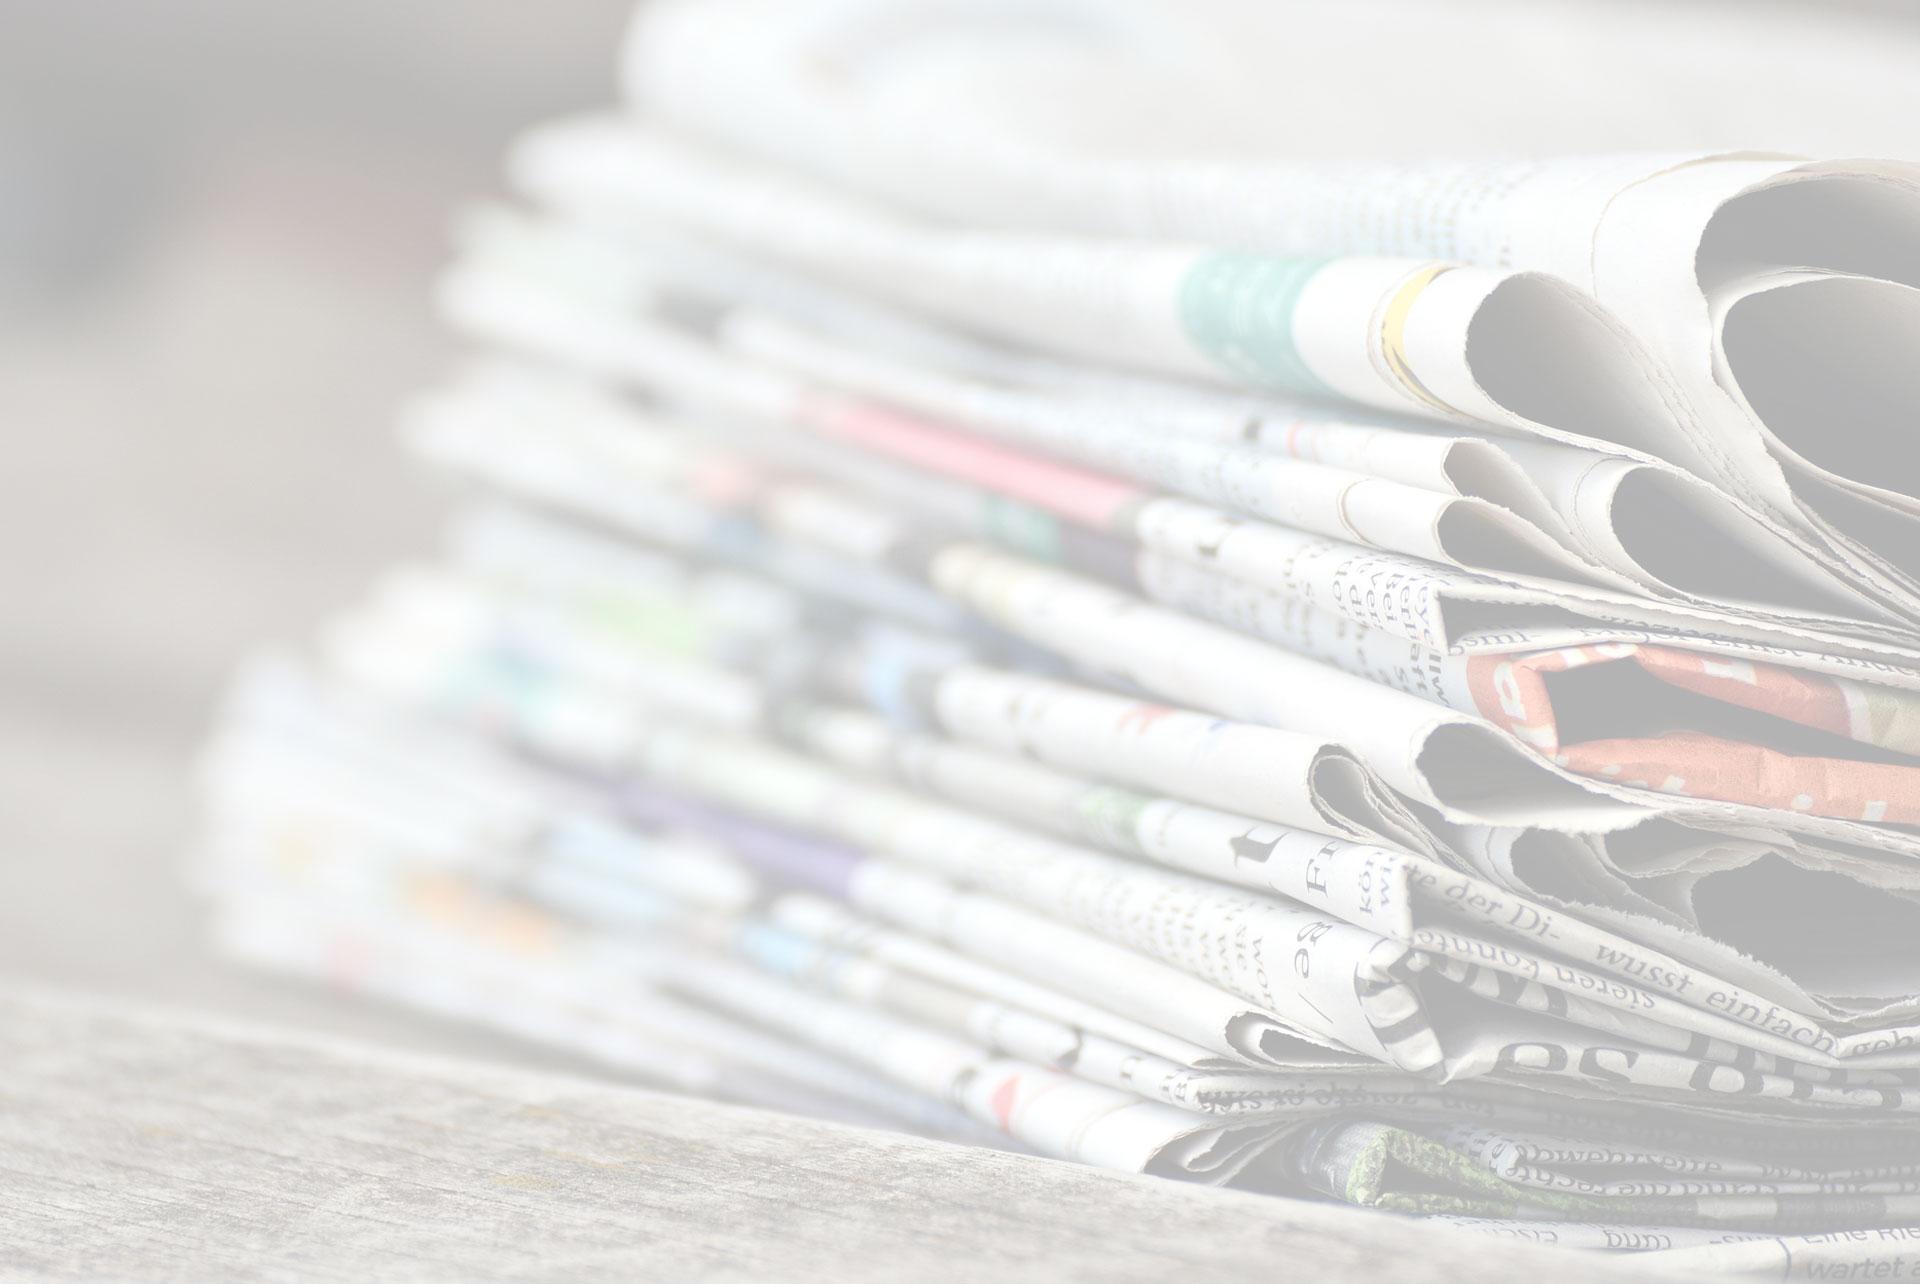 Sissy Trovato Mazza